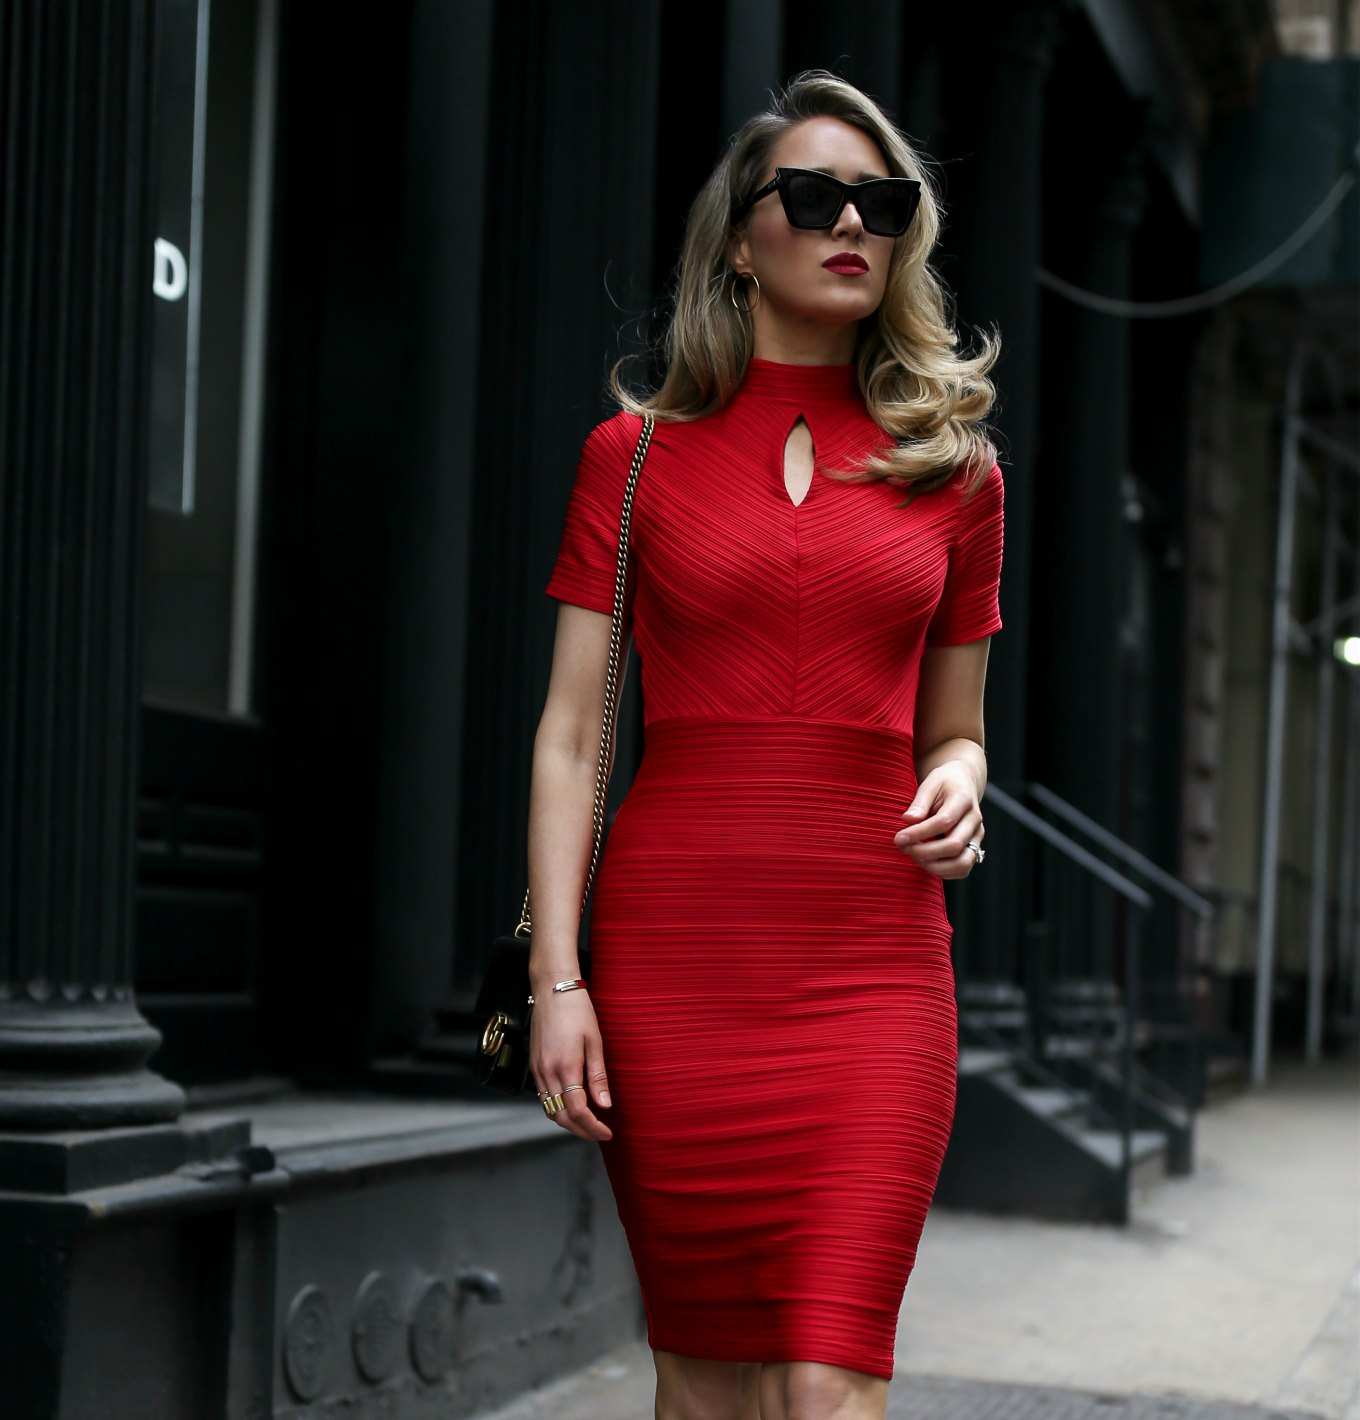 Classic Red Sheath Dress